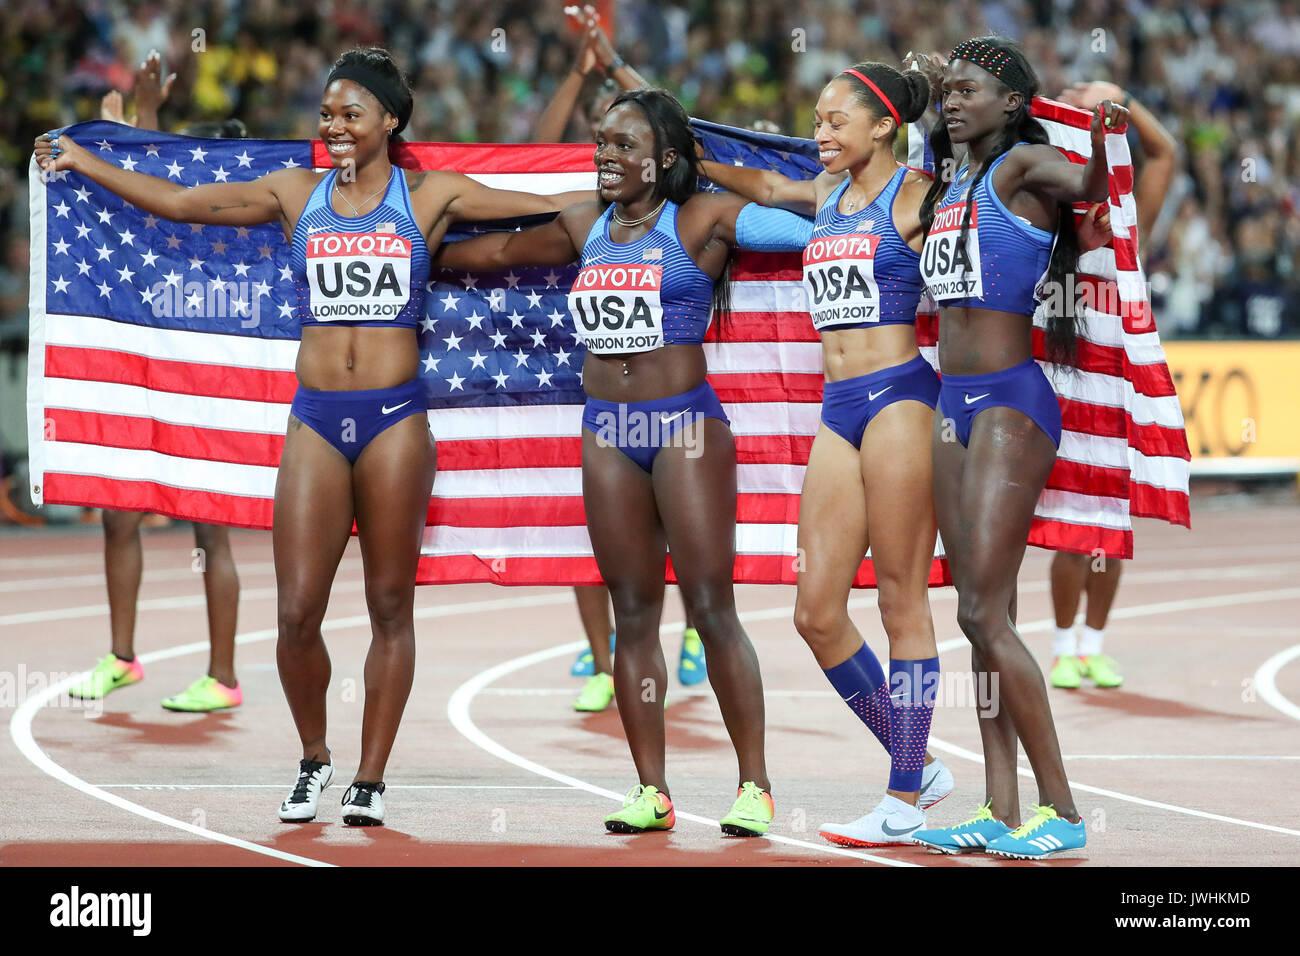 Team USA feiern ihren Sieg in der 4x100 m Staffel der Frauen am Tag neun der IAAF London 2017 Weltmeisterschaften am London Stadion. © Paul Davey. Stockbild